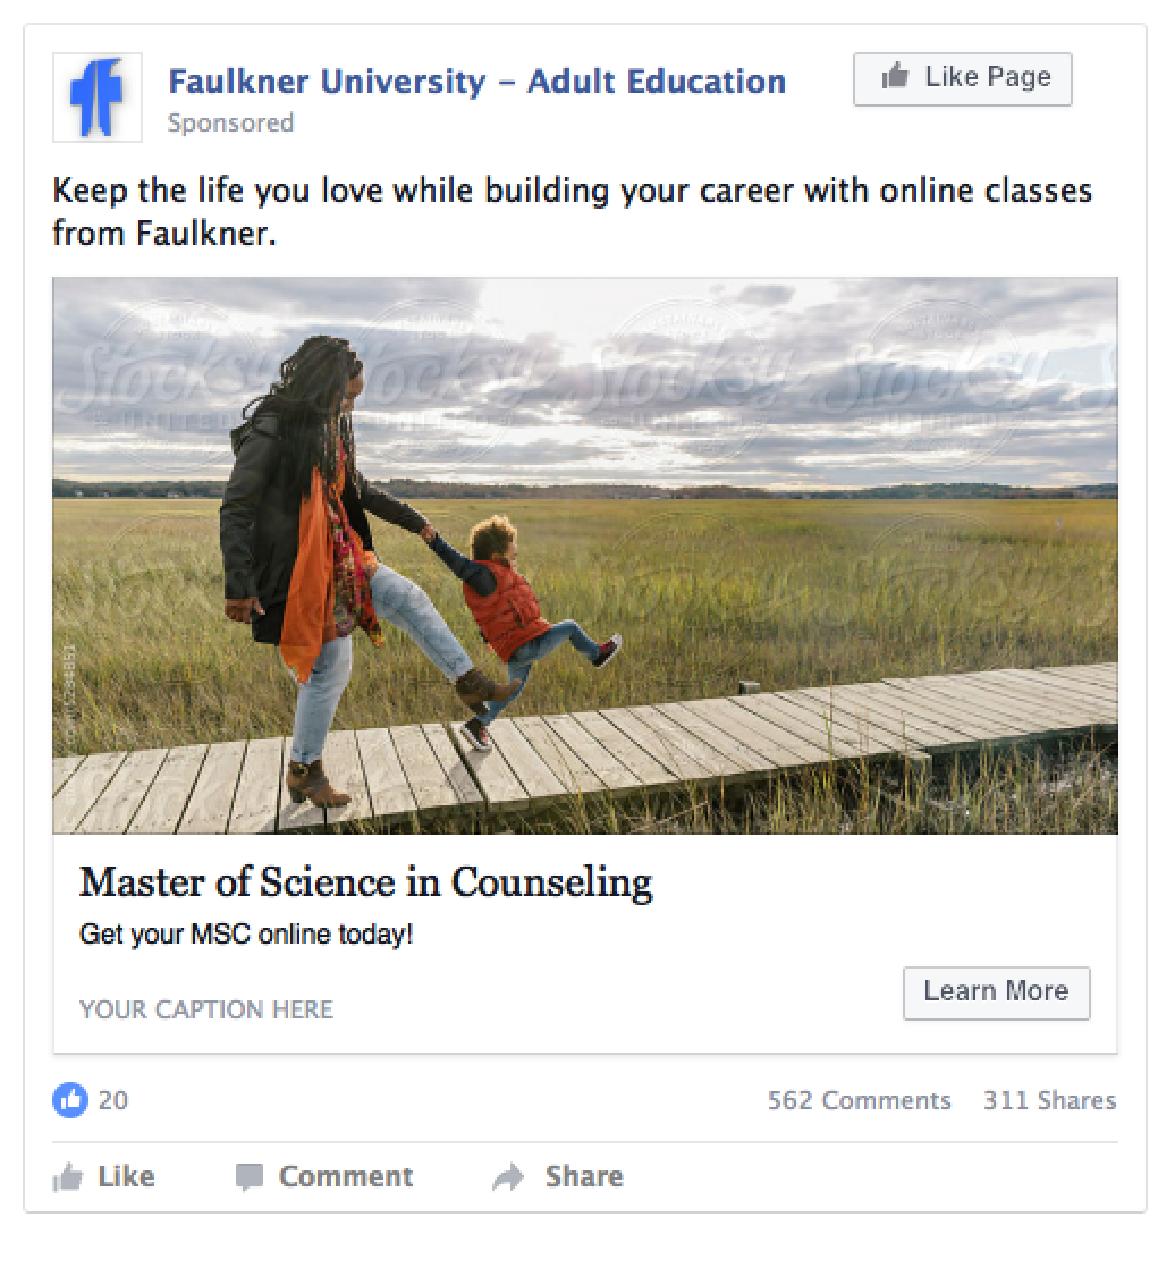 Faulkner University lead generation ad